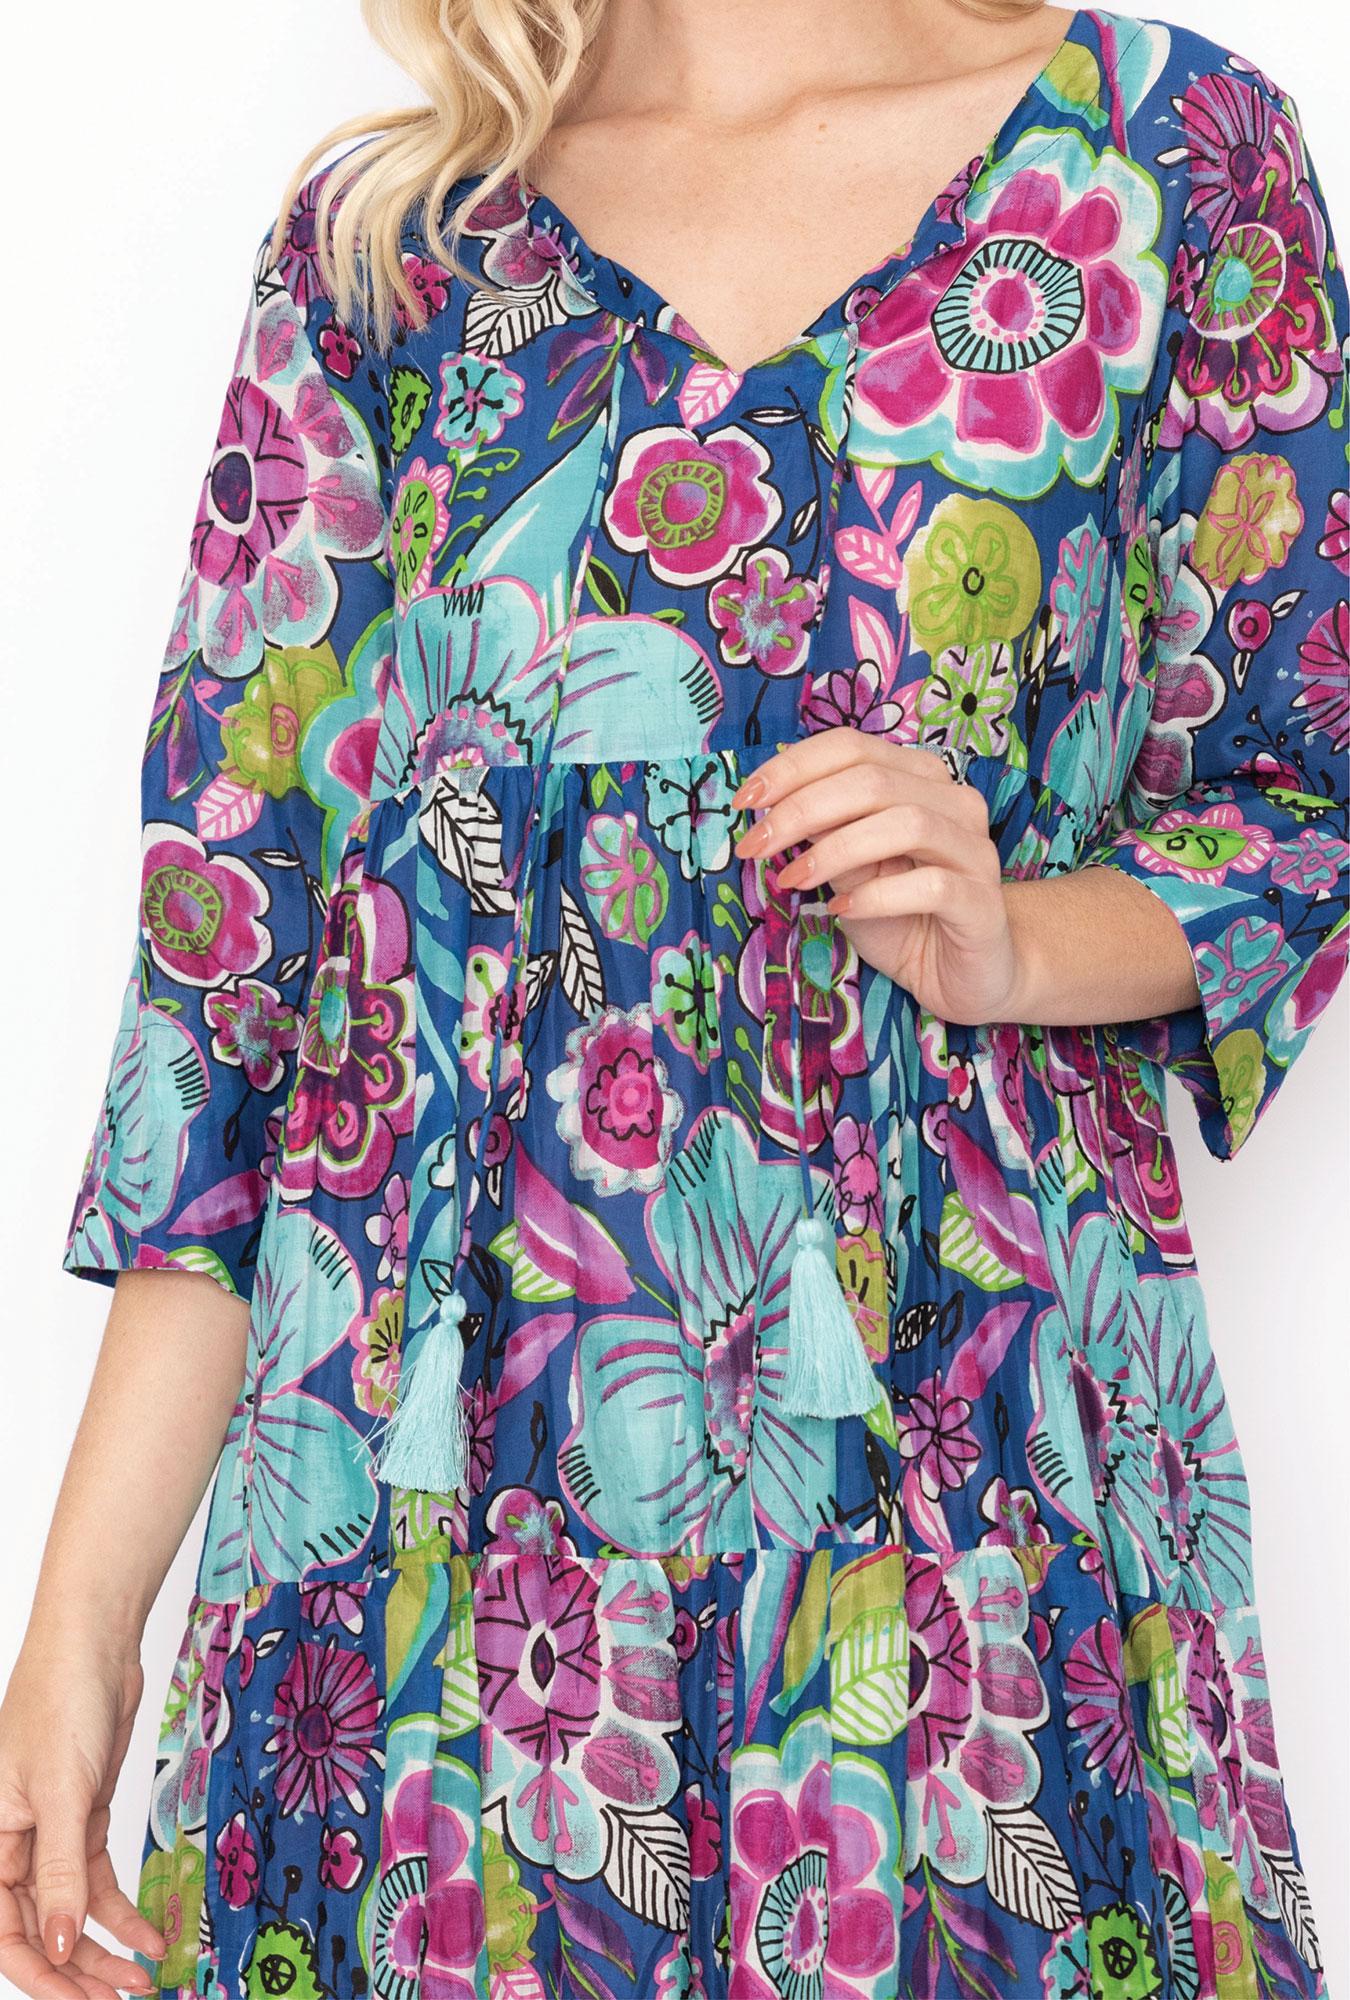 Poppy Dress in Blue Graphic Flowers